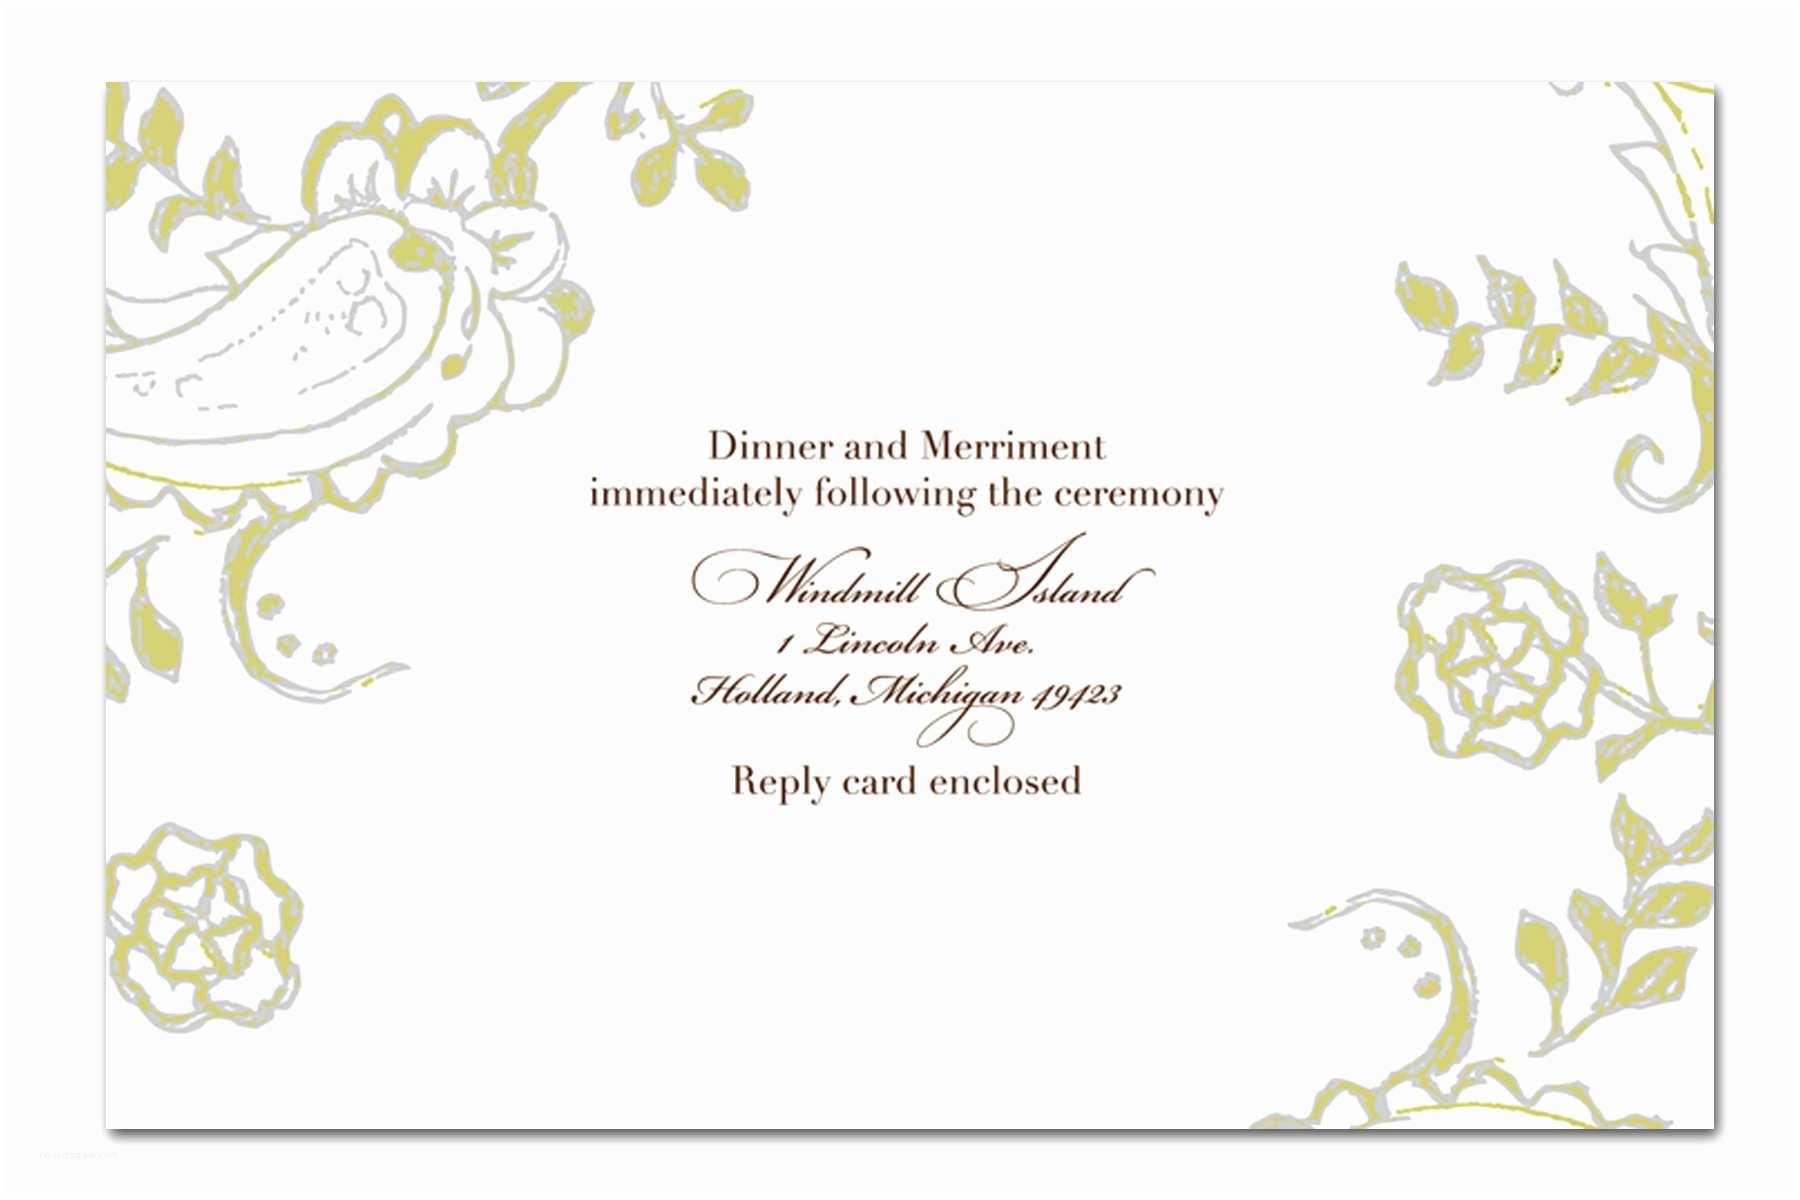 Wedding Invitation Design Templates Free Download Handmade Wedding Invitation Template Design